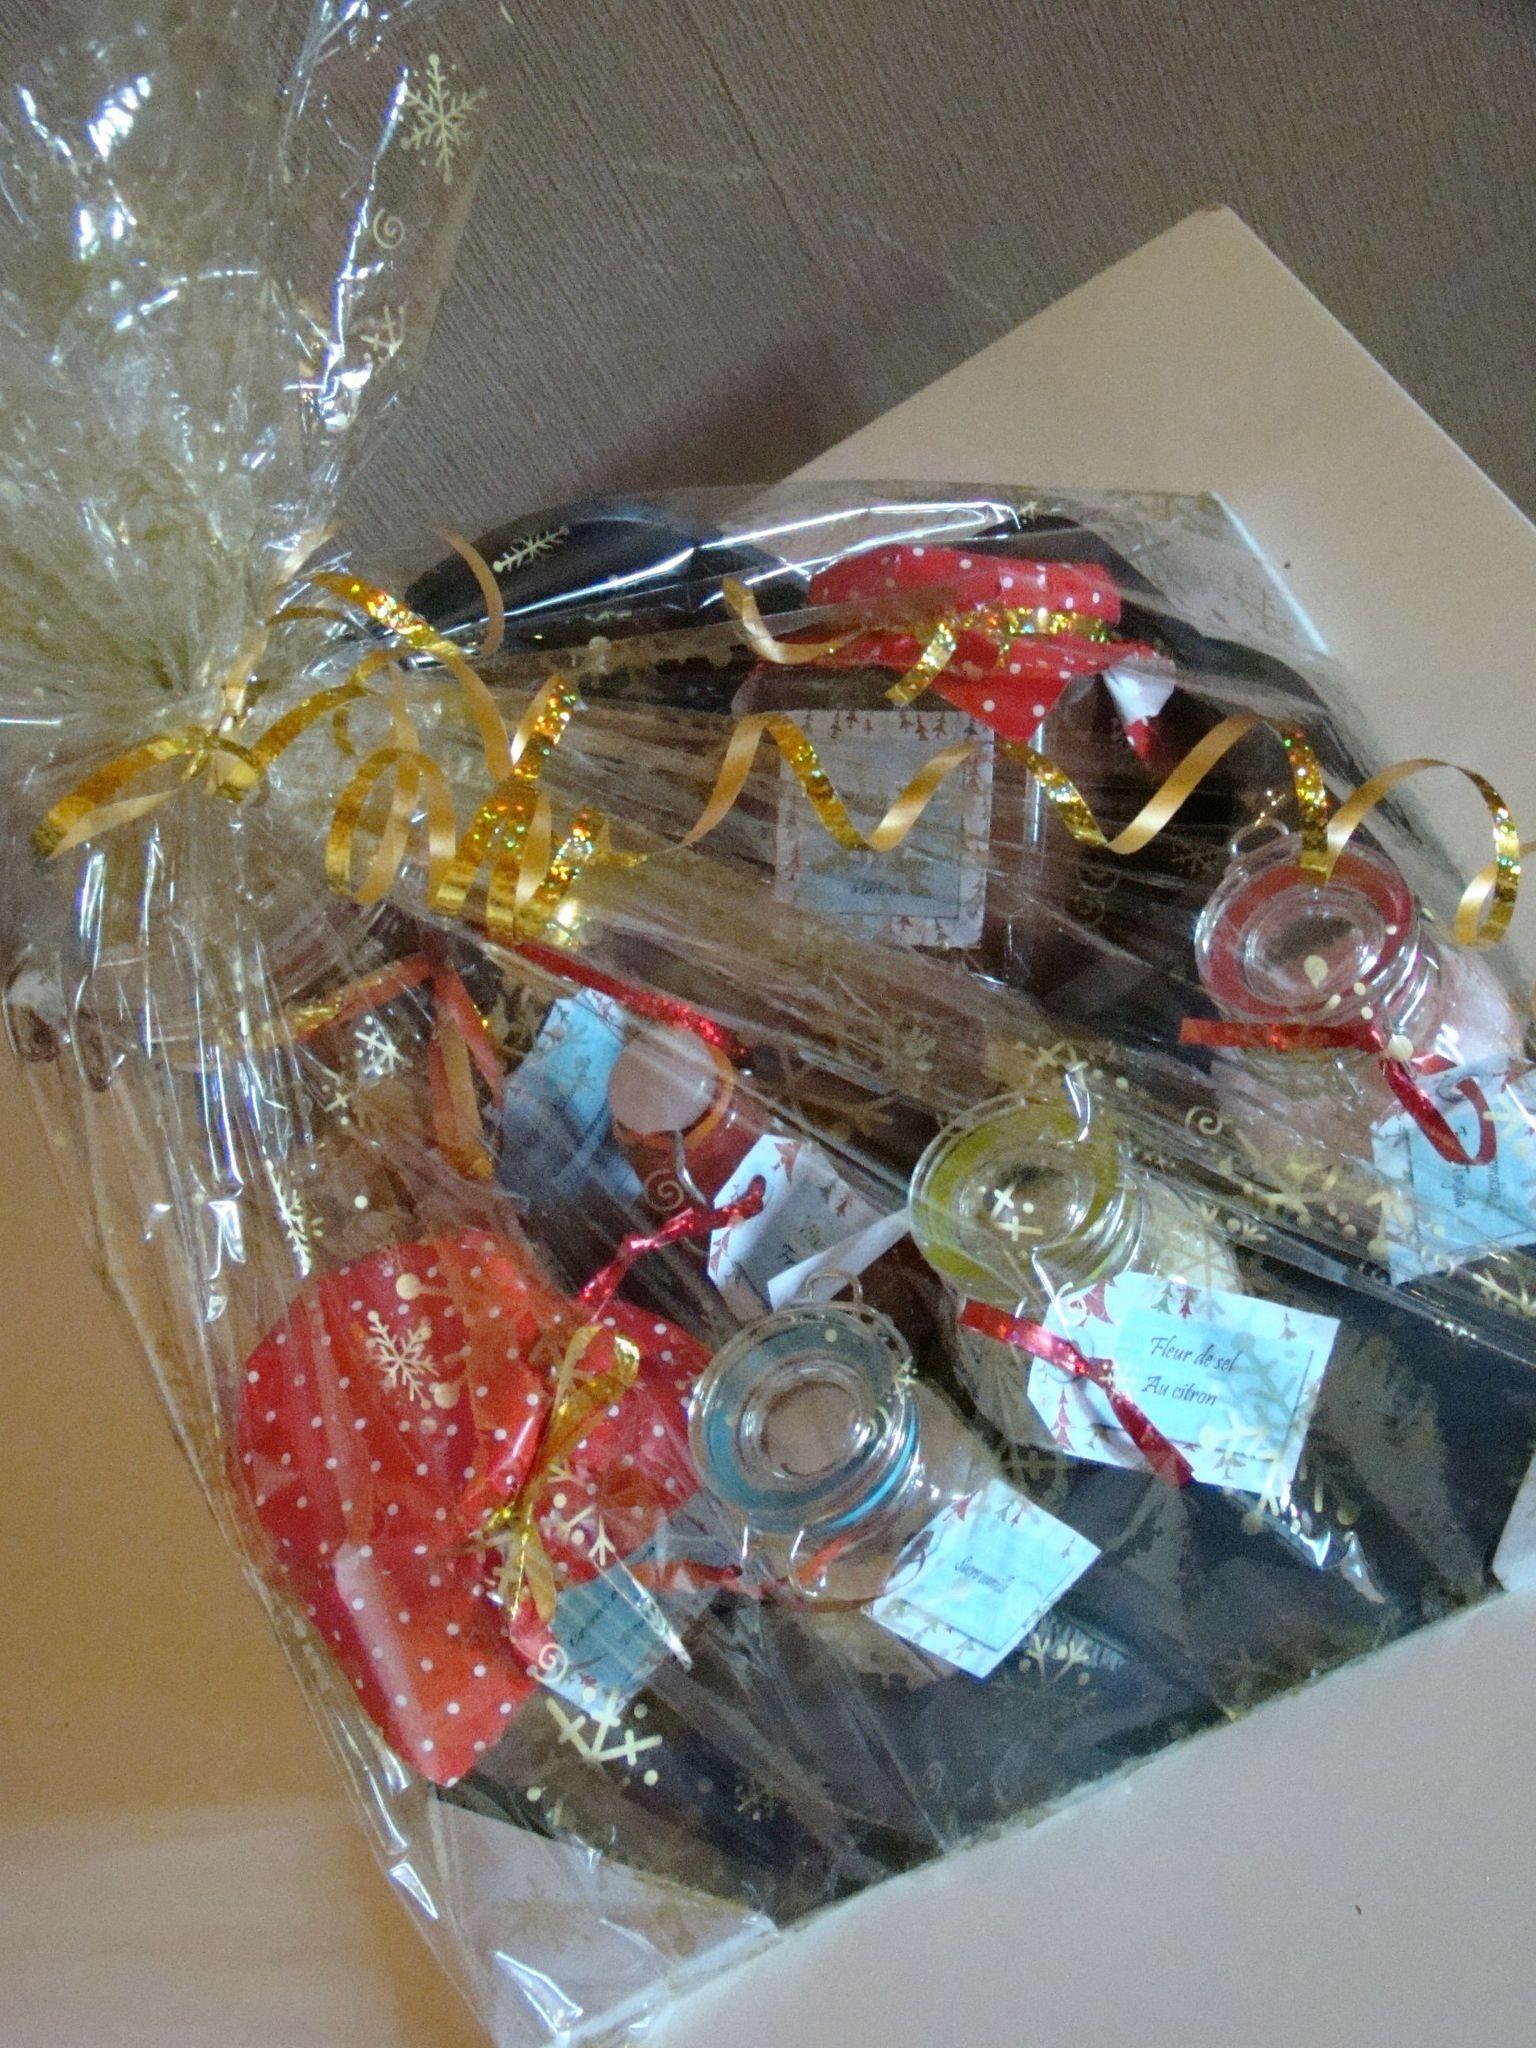 Panier gourmand de Noel - Creamylicious   Panier gourmand noel, Cadeaux de noël faits maison et ...